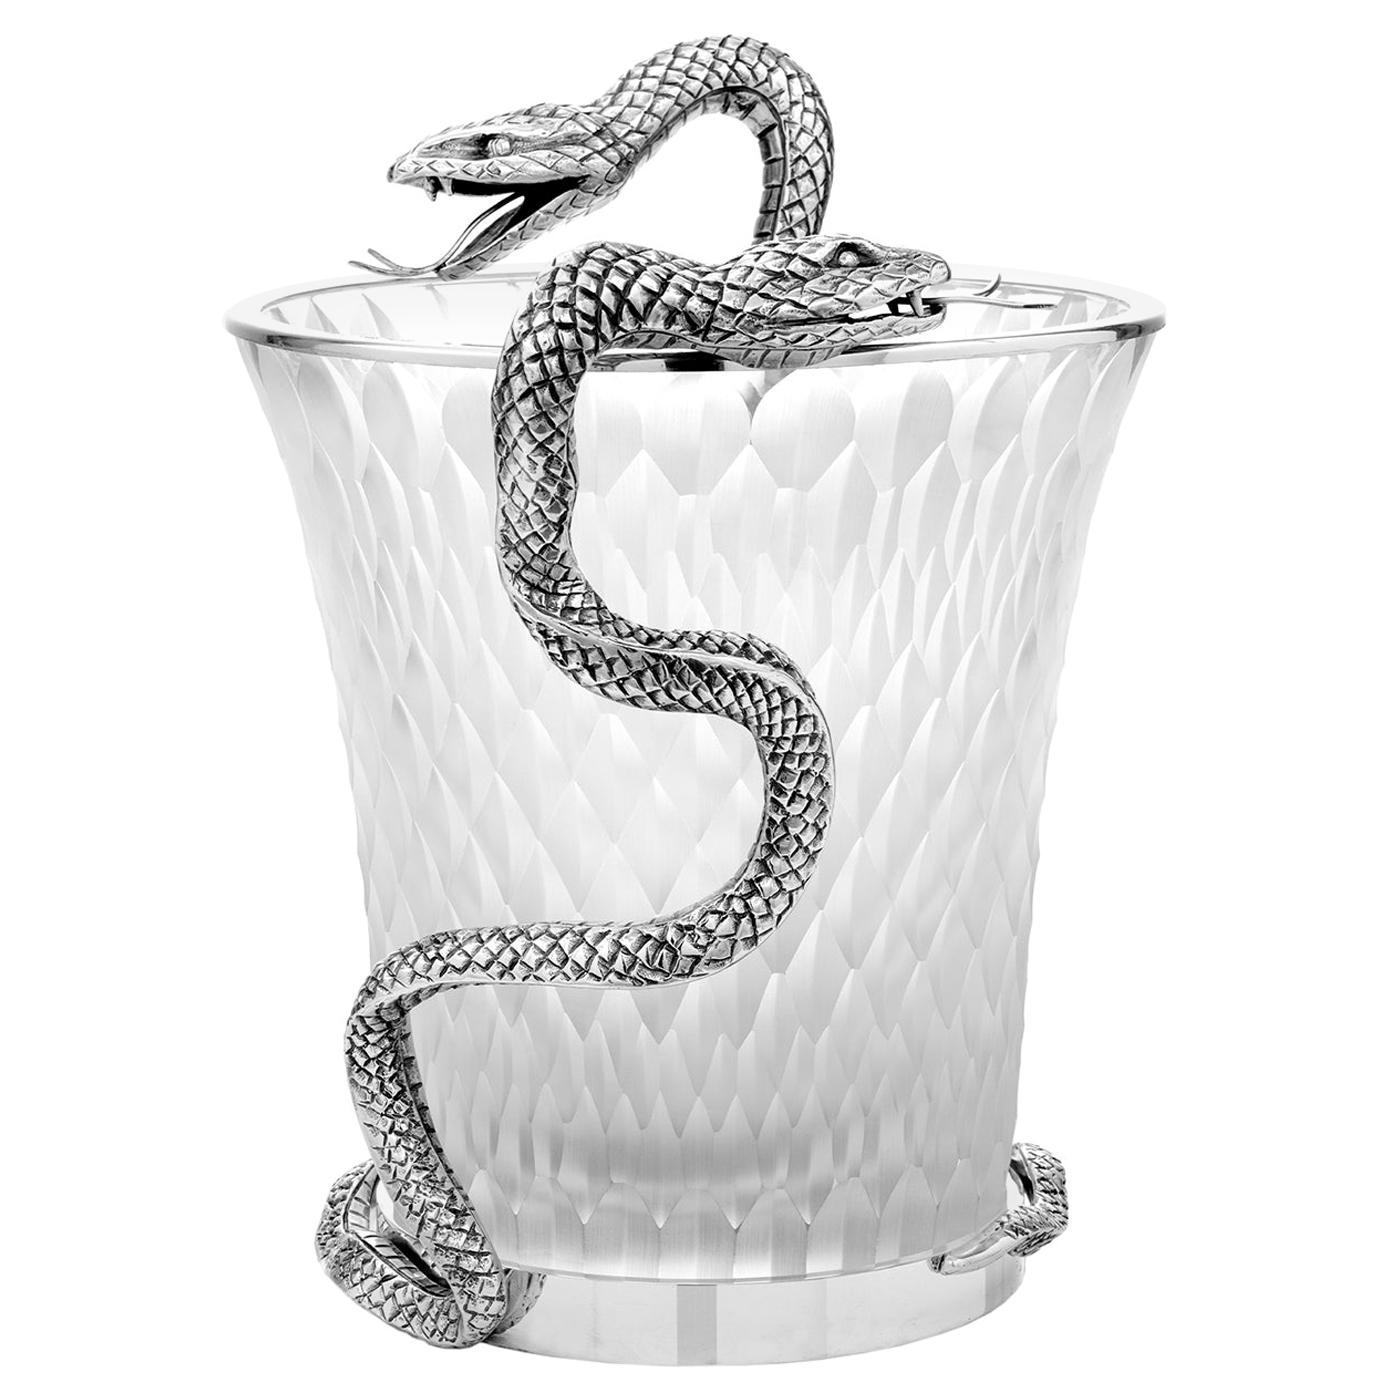 Snake Ice Bucket